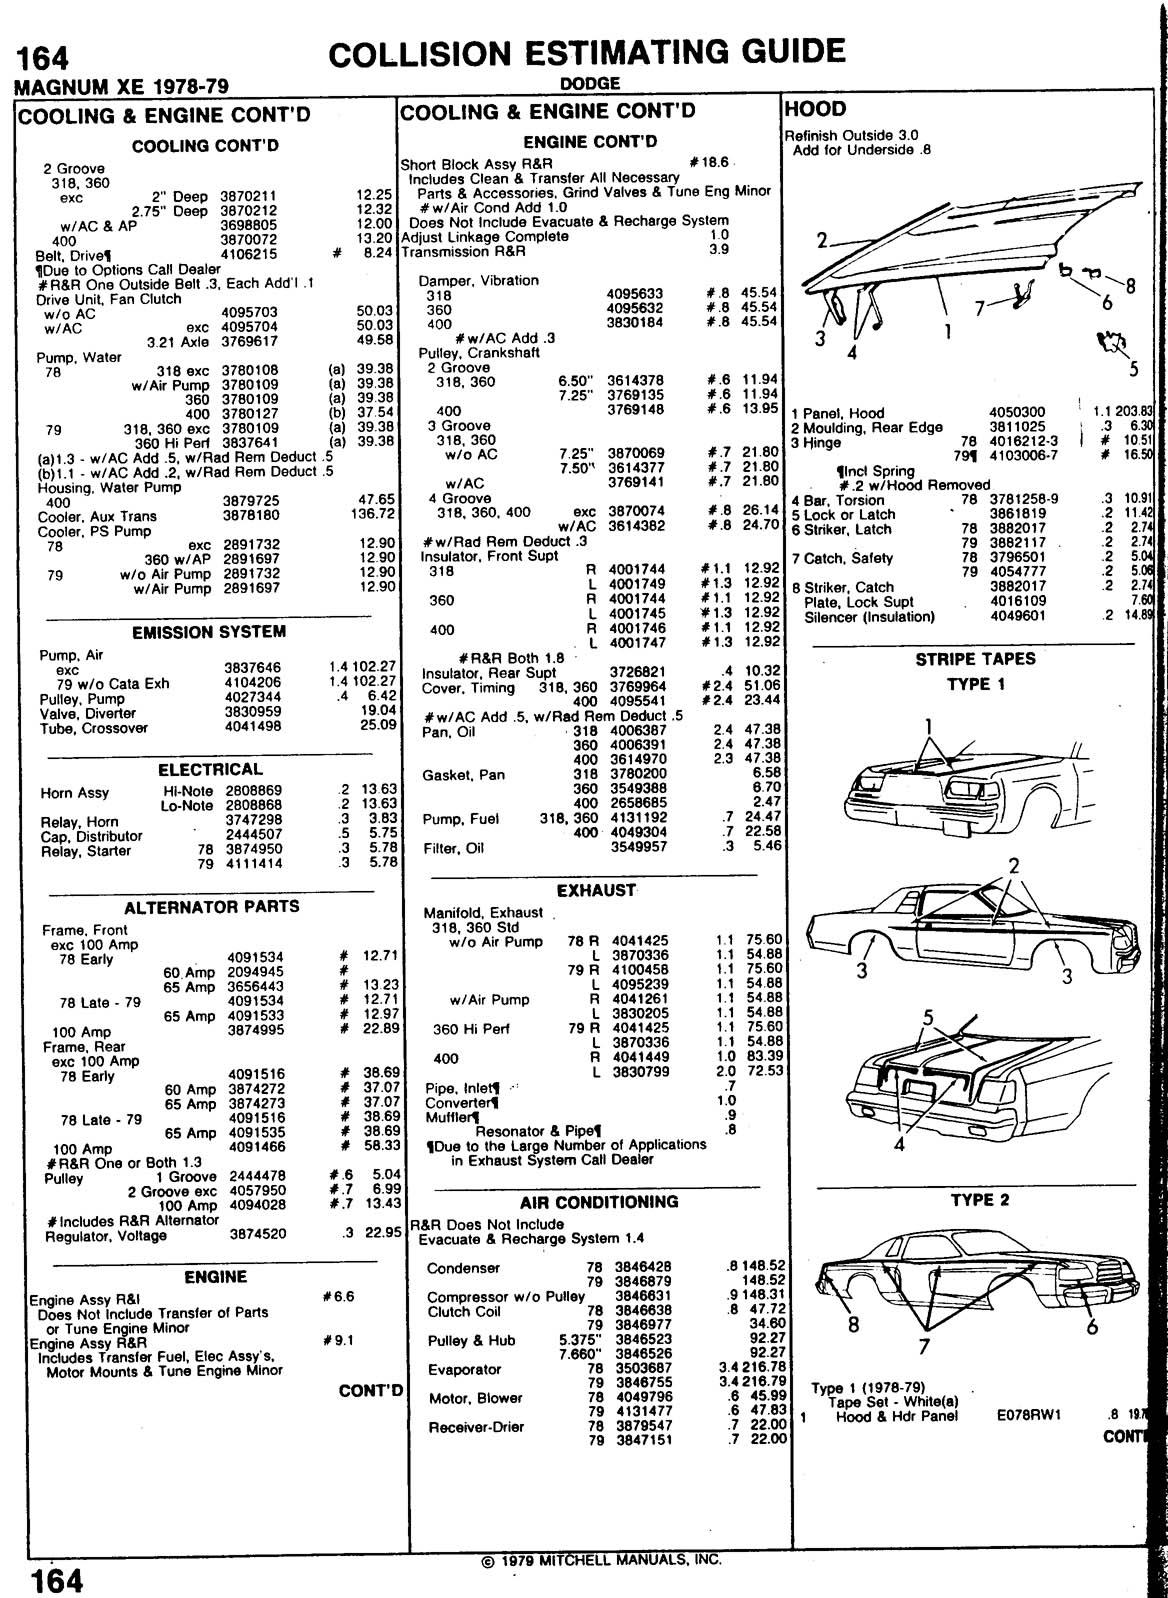 Collision Estimate Sheets